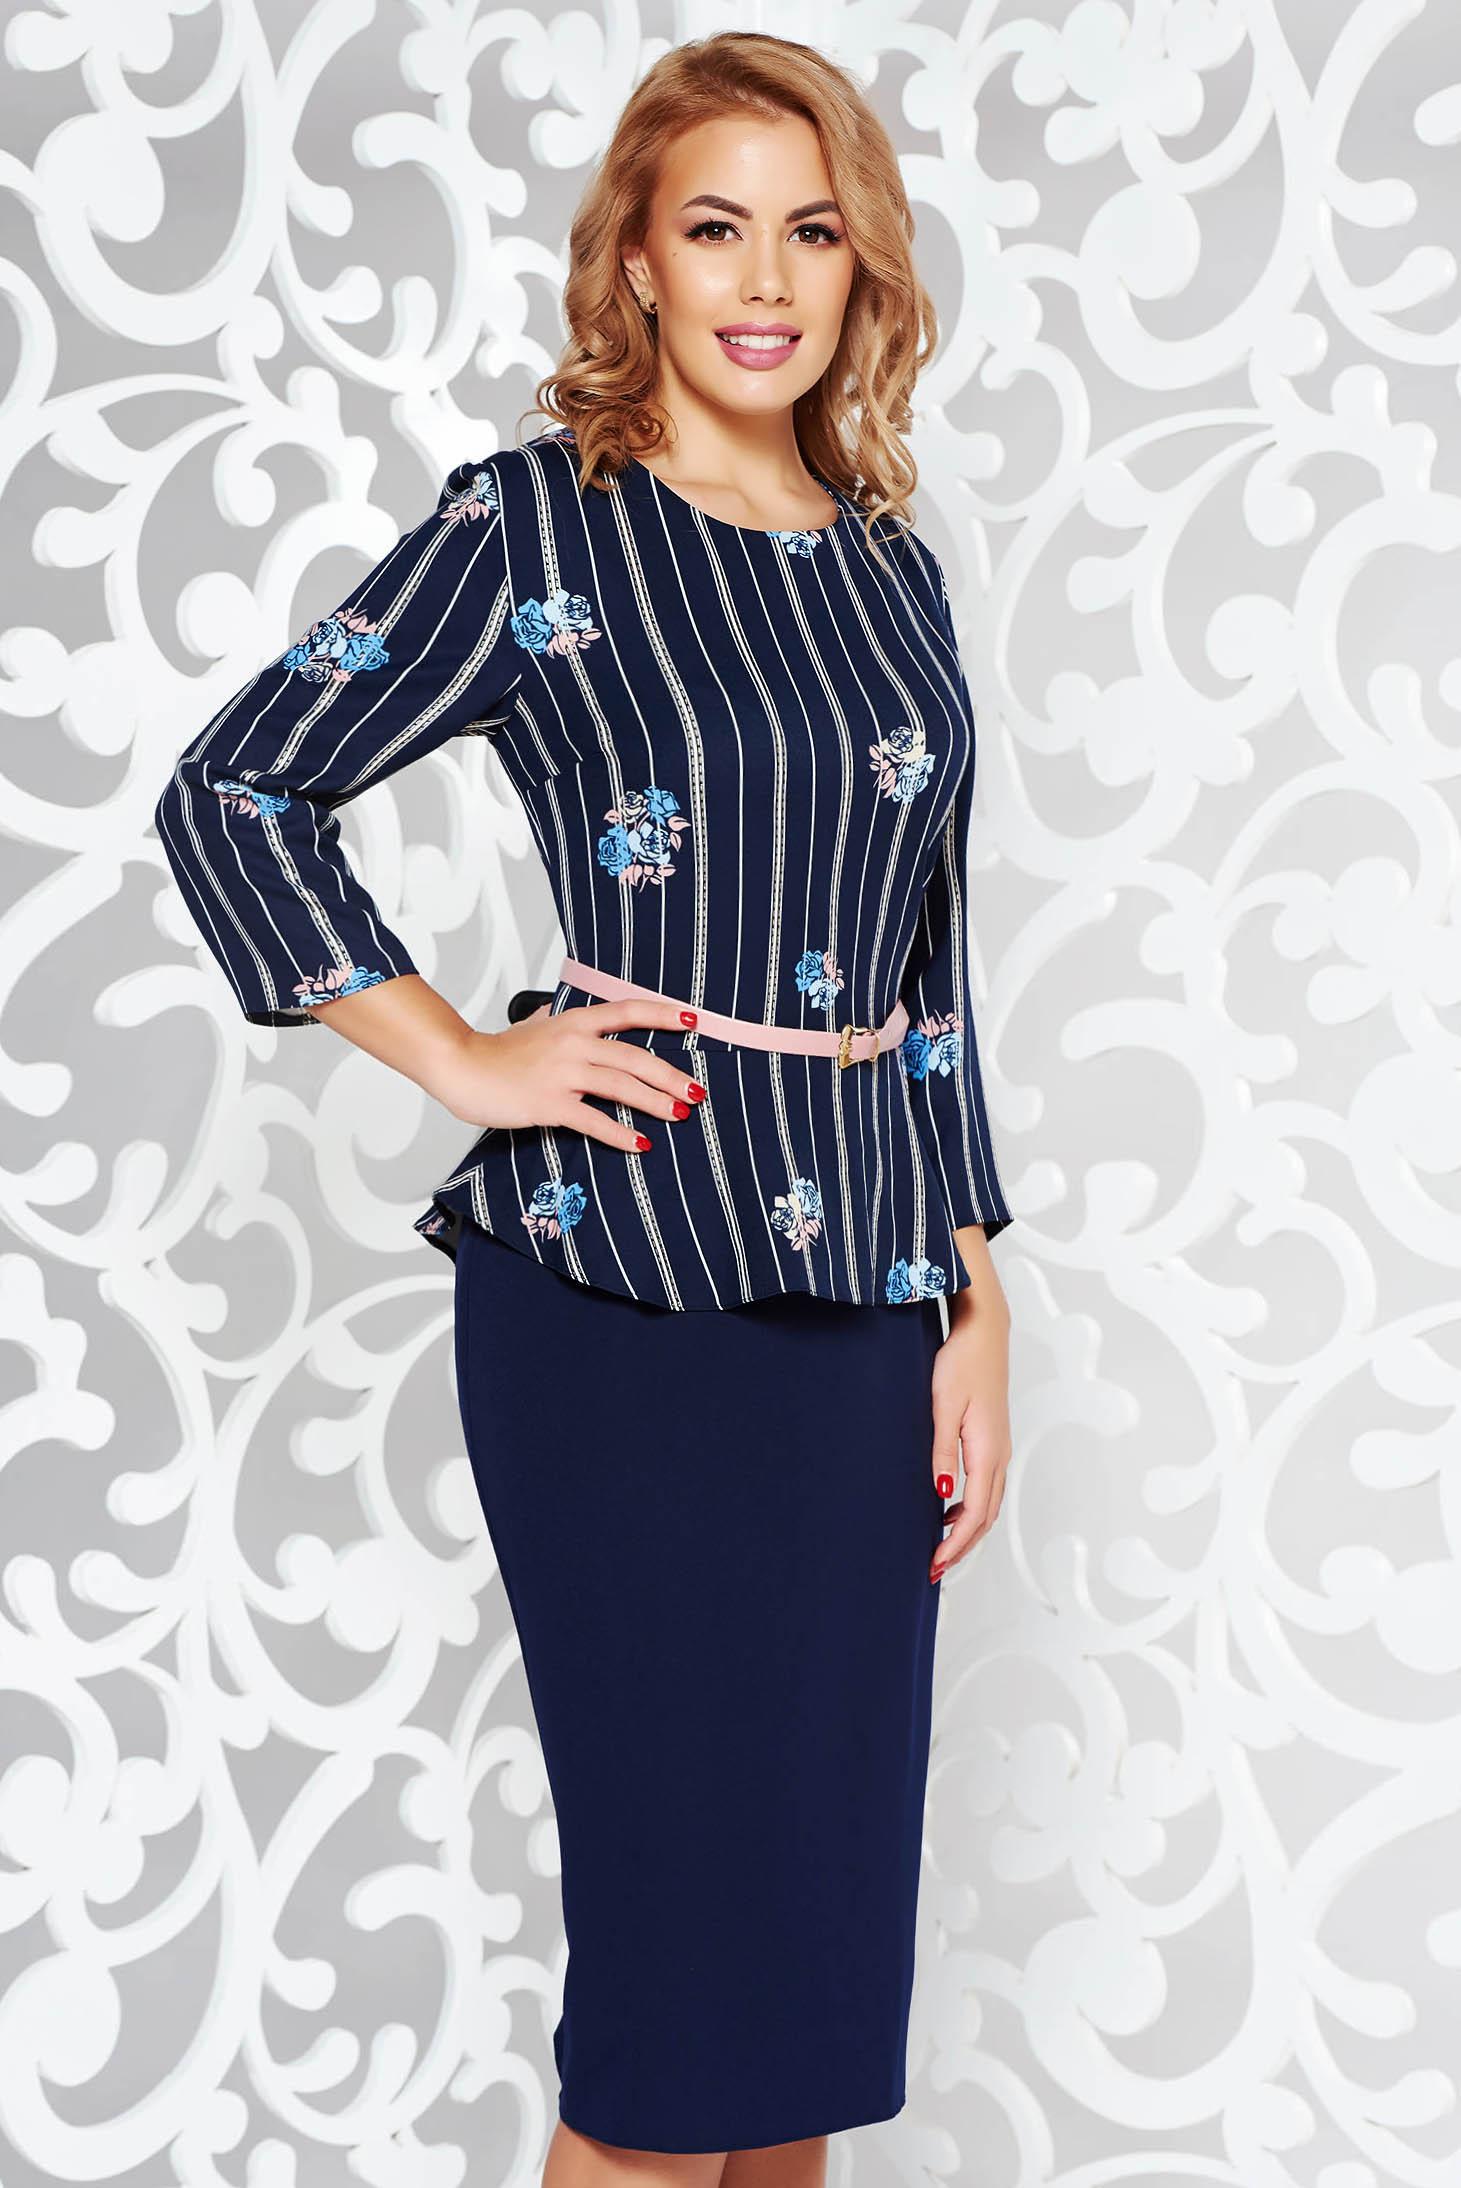 Rochie albastru-inchis office tip creion din stofa usor elastica cu peplum cu accesoriu tip curea